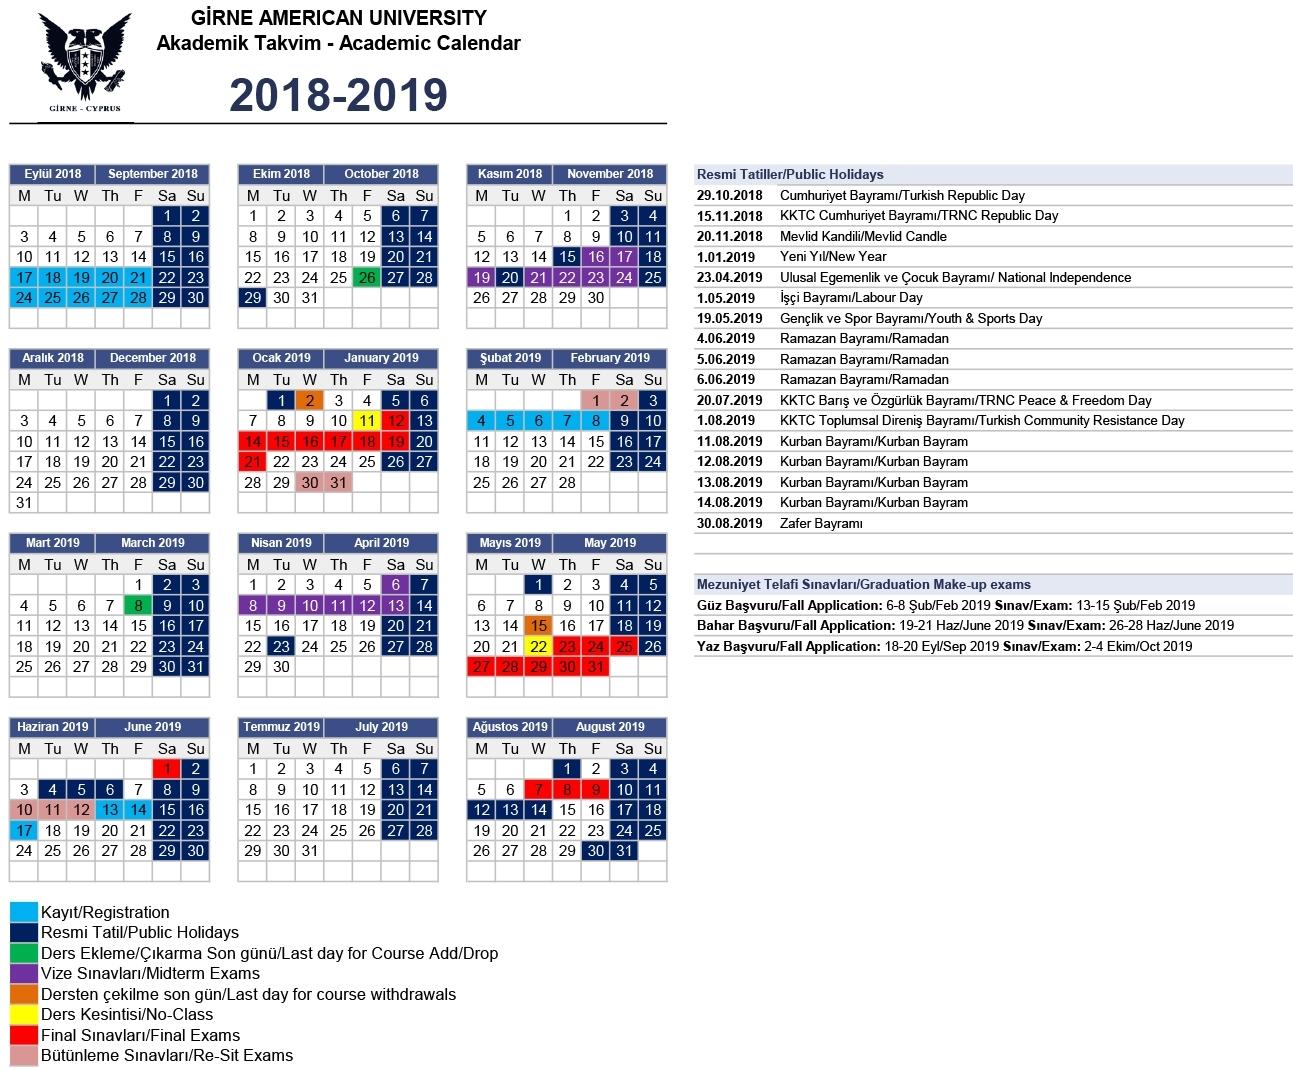 Academic Calendar - Girne American University